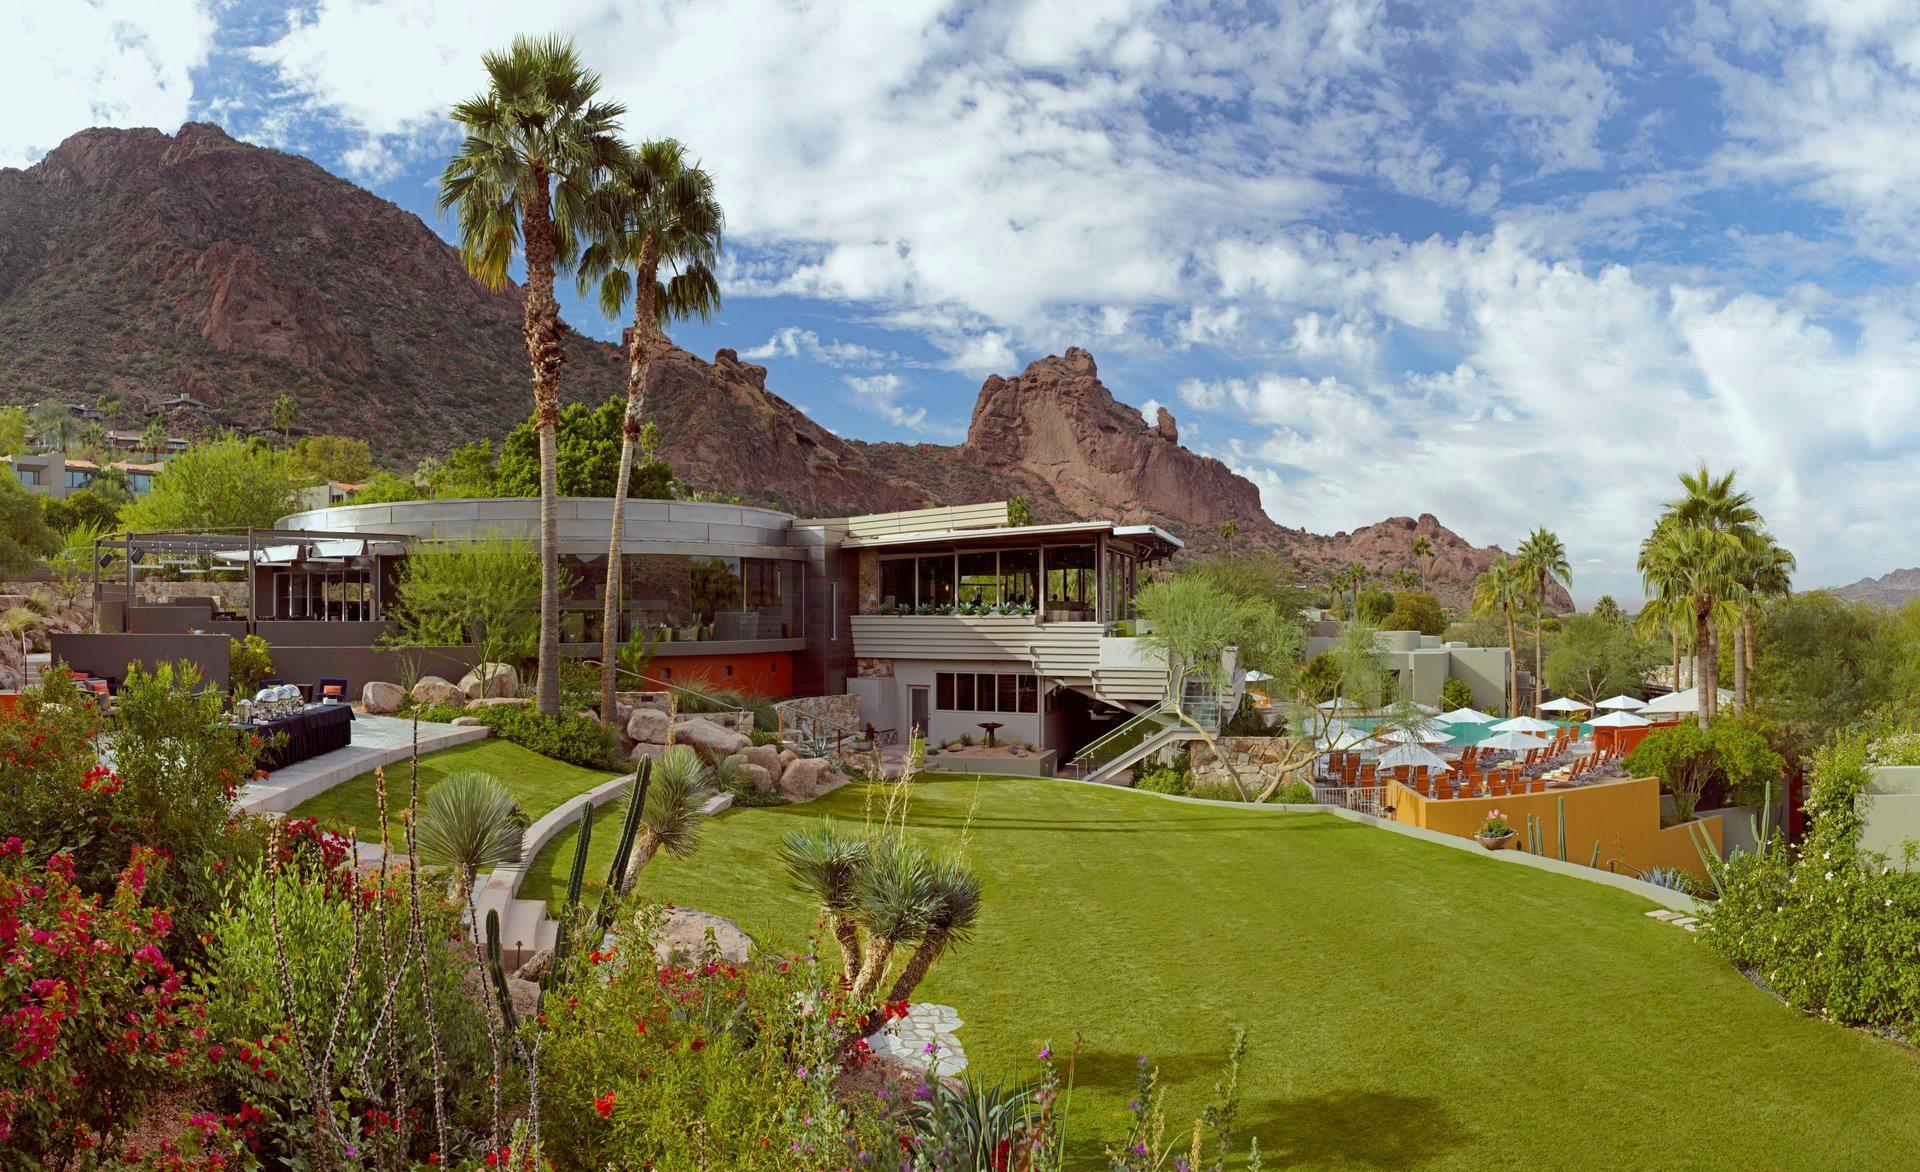 087 3 2855 jpeg large - Sanctuary Camelback Mountain Resort & Spa, Scottsdale